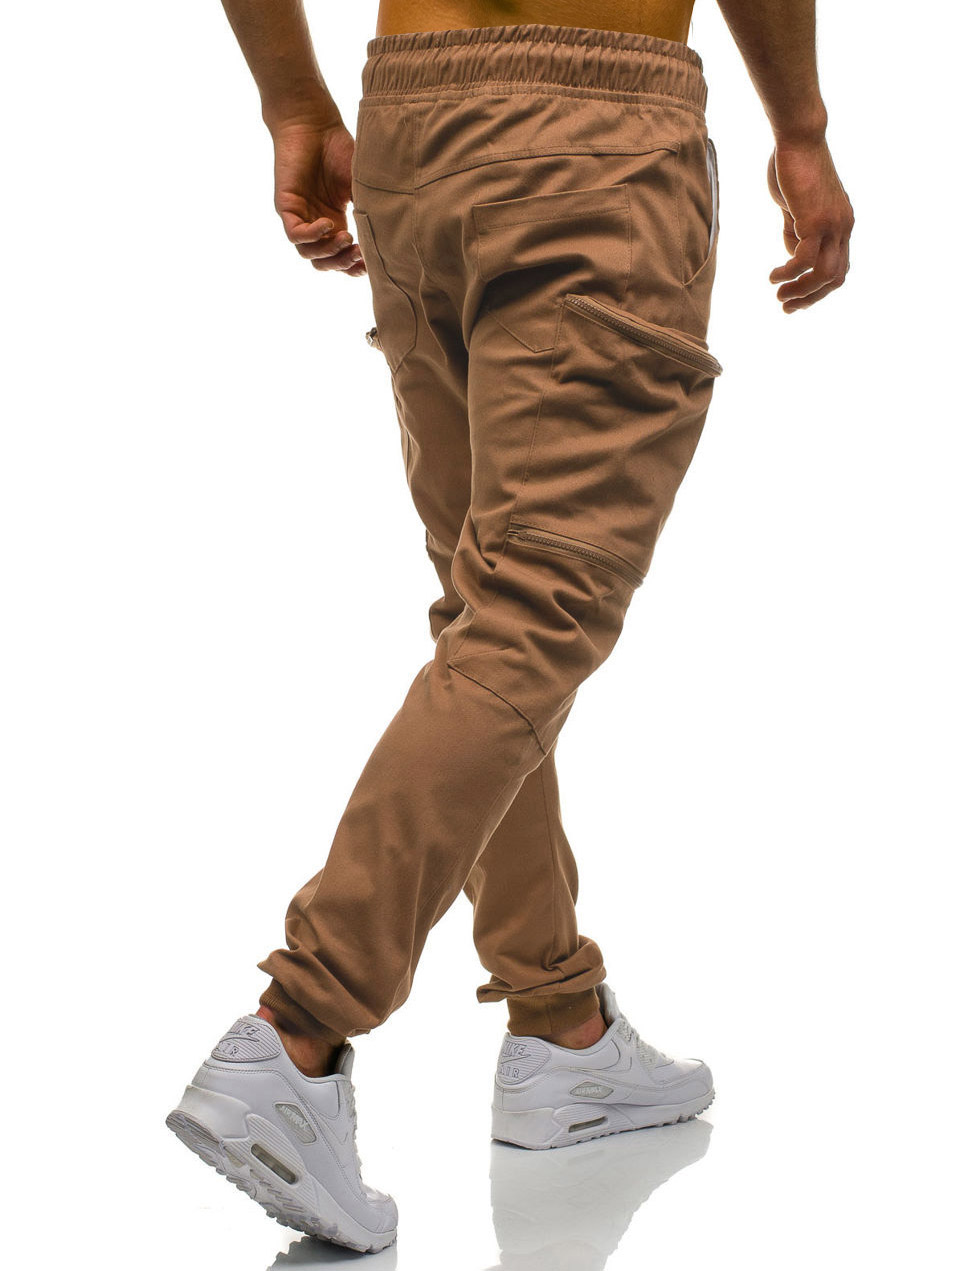 HTB1VFruL4YaK1RjSZFnq6y80pXa9 Mens Joggers 2019 New Red Camouflage Multi-Pockets Cargo Pants Men Cotton Harem Pants Hip Hop Trousers Streetwear XXXL